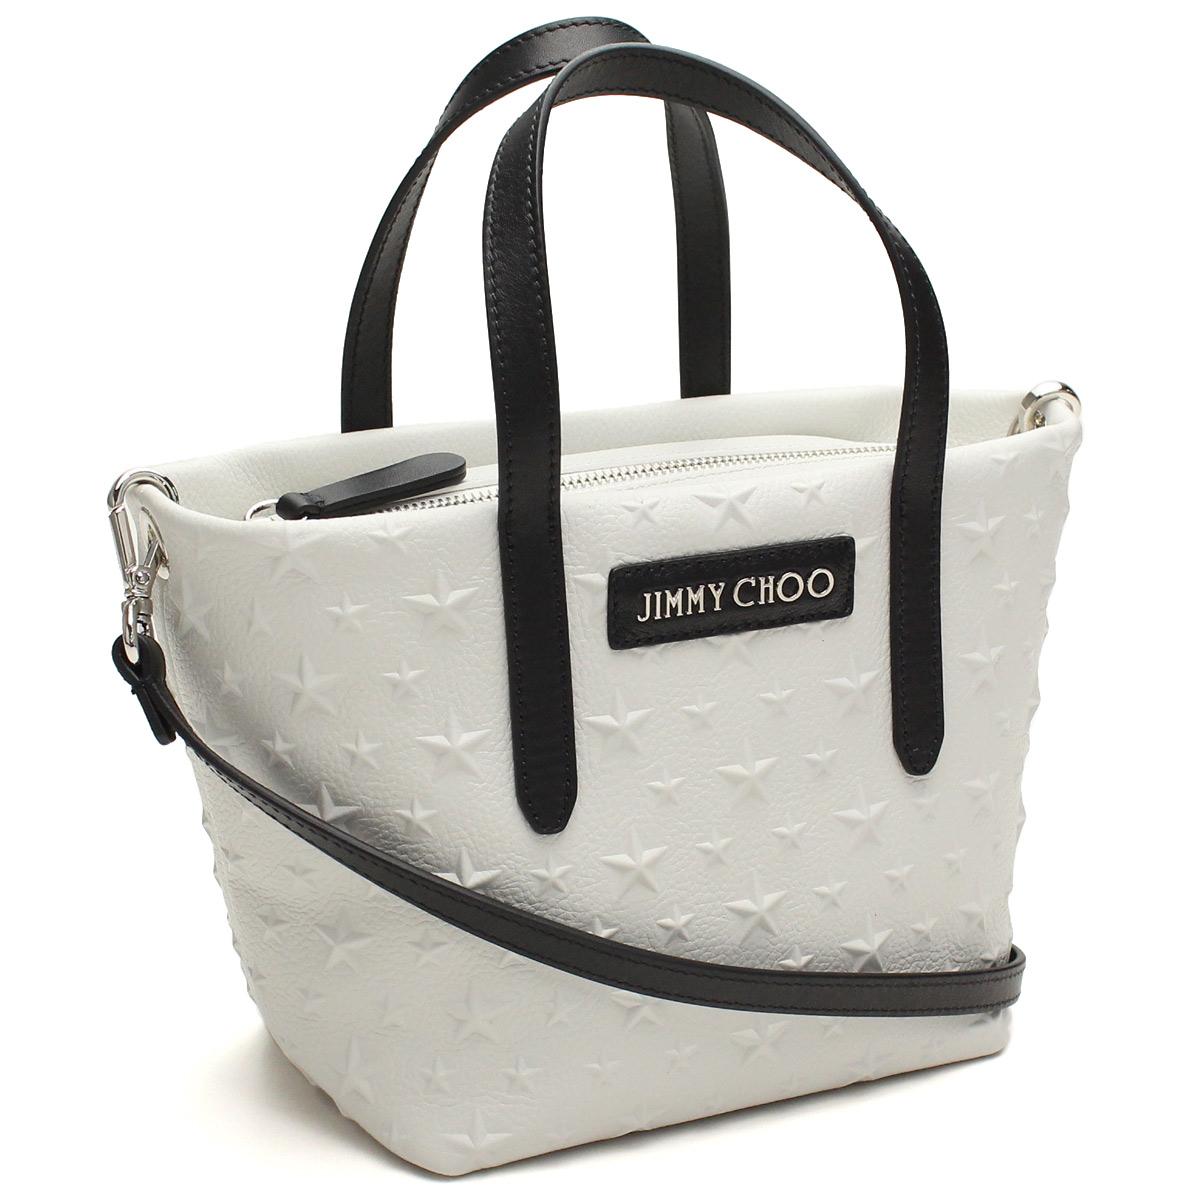 61278cbe69d (JIMMY CHOO) Jimmy Choo handbags MINISARA EMG CHALK white series(  taxfree send